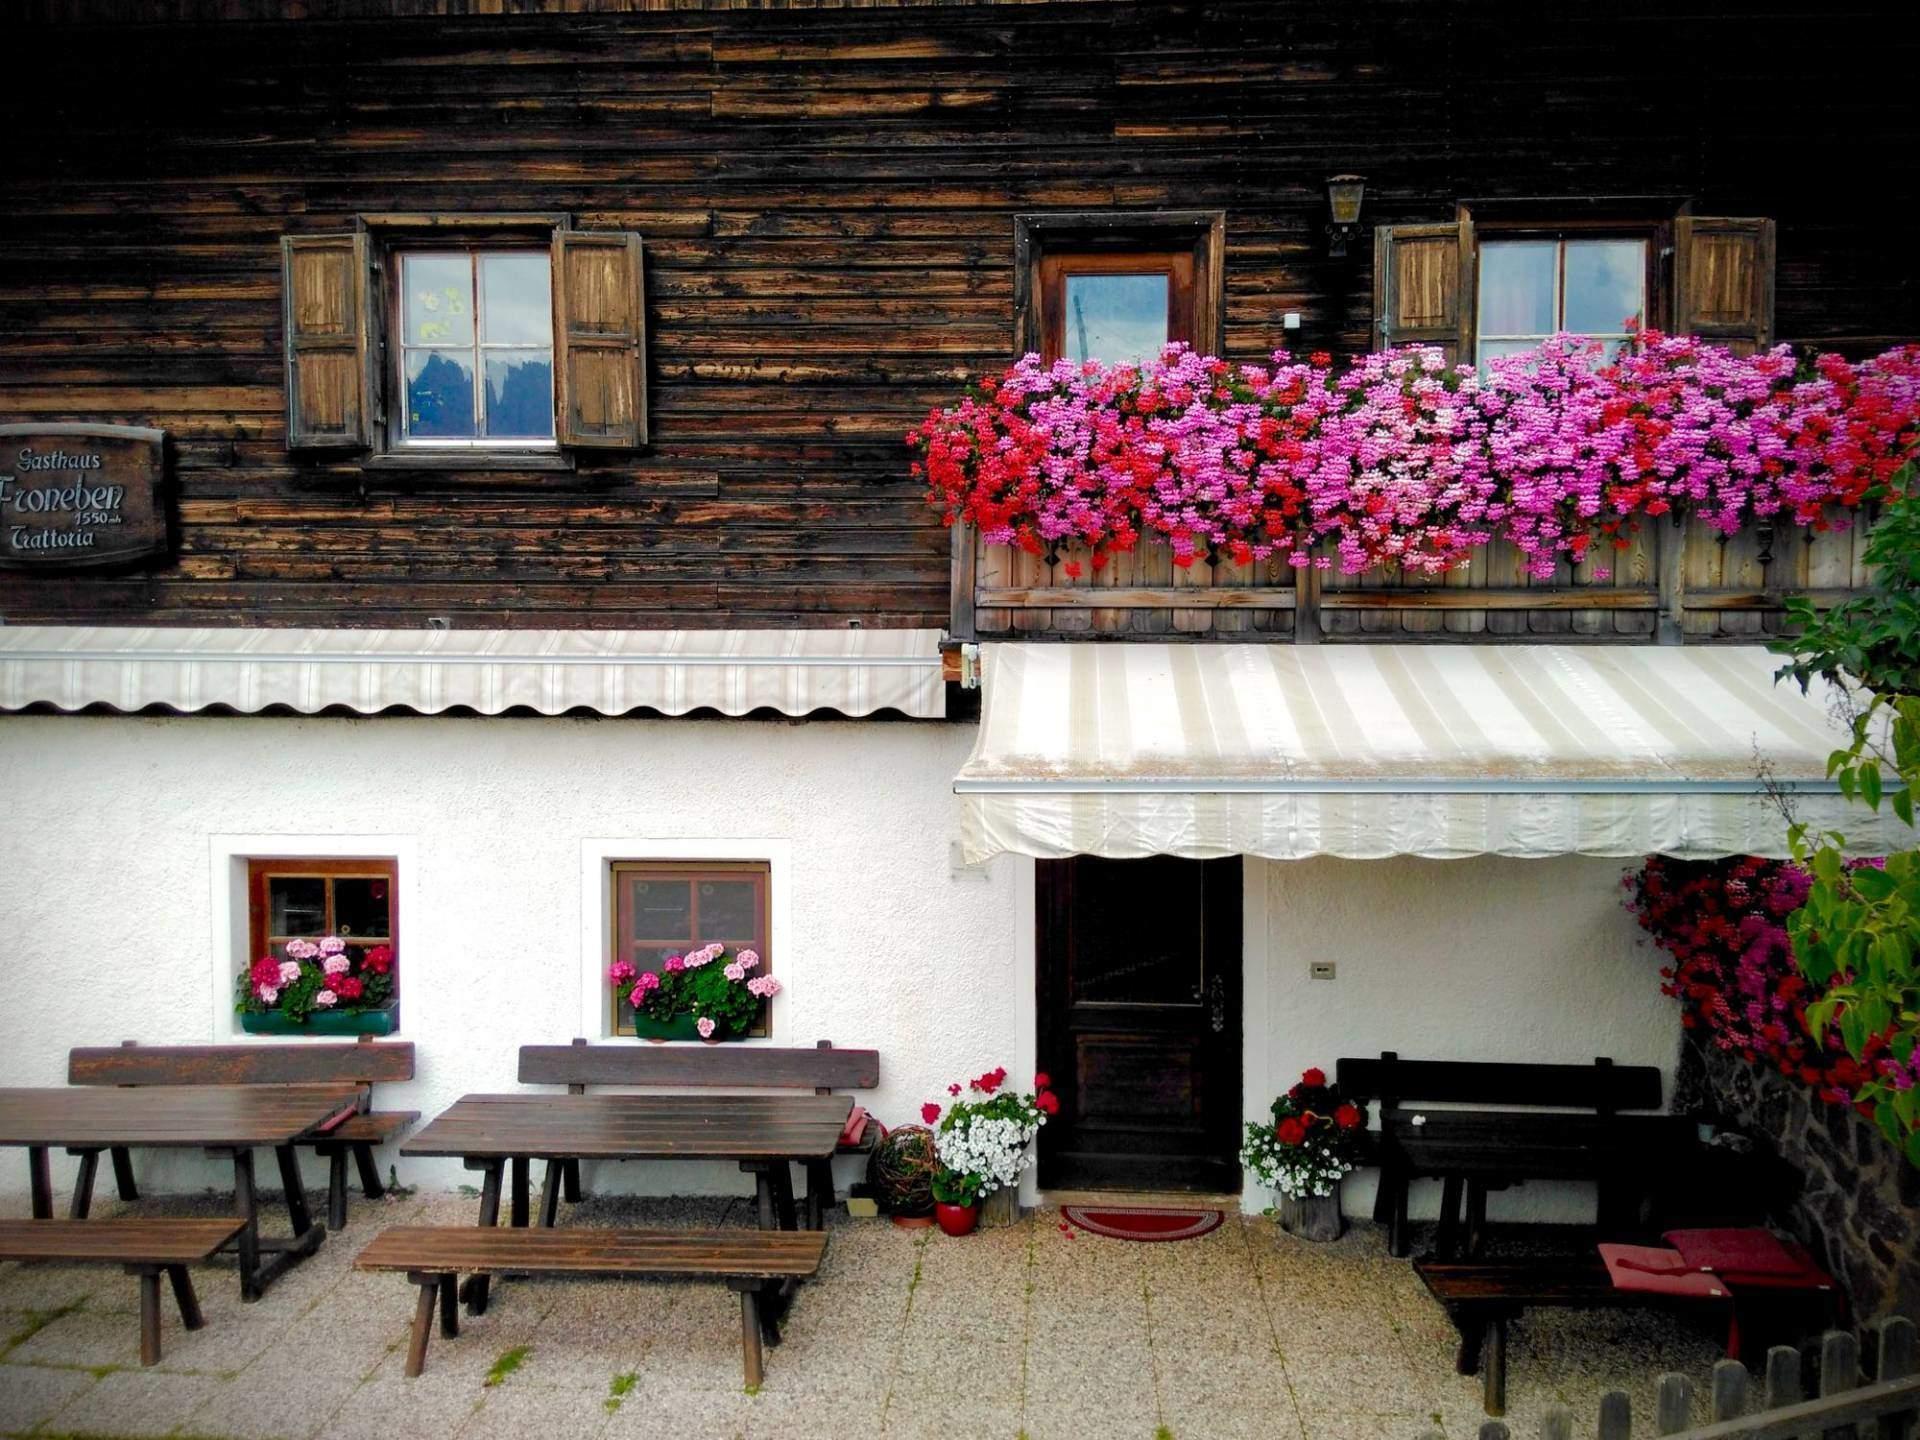 Froneben Gasthaus Ristorante Moso BZ- istantidigitali - Massimiliano Scarpa photographer